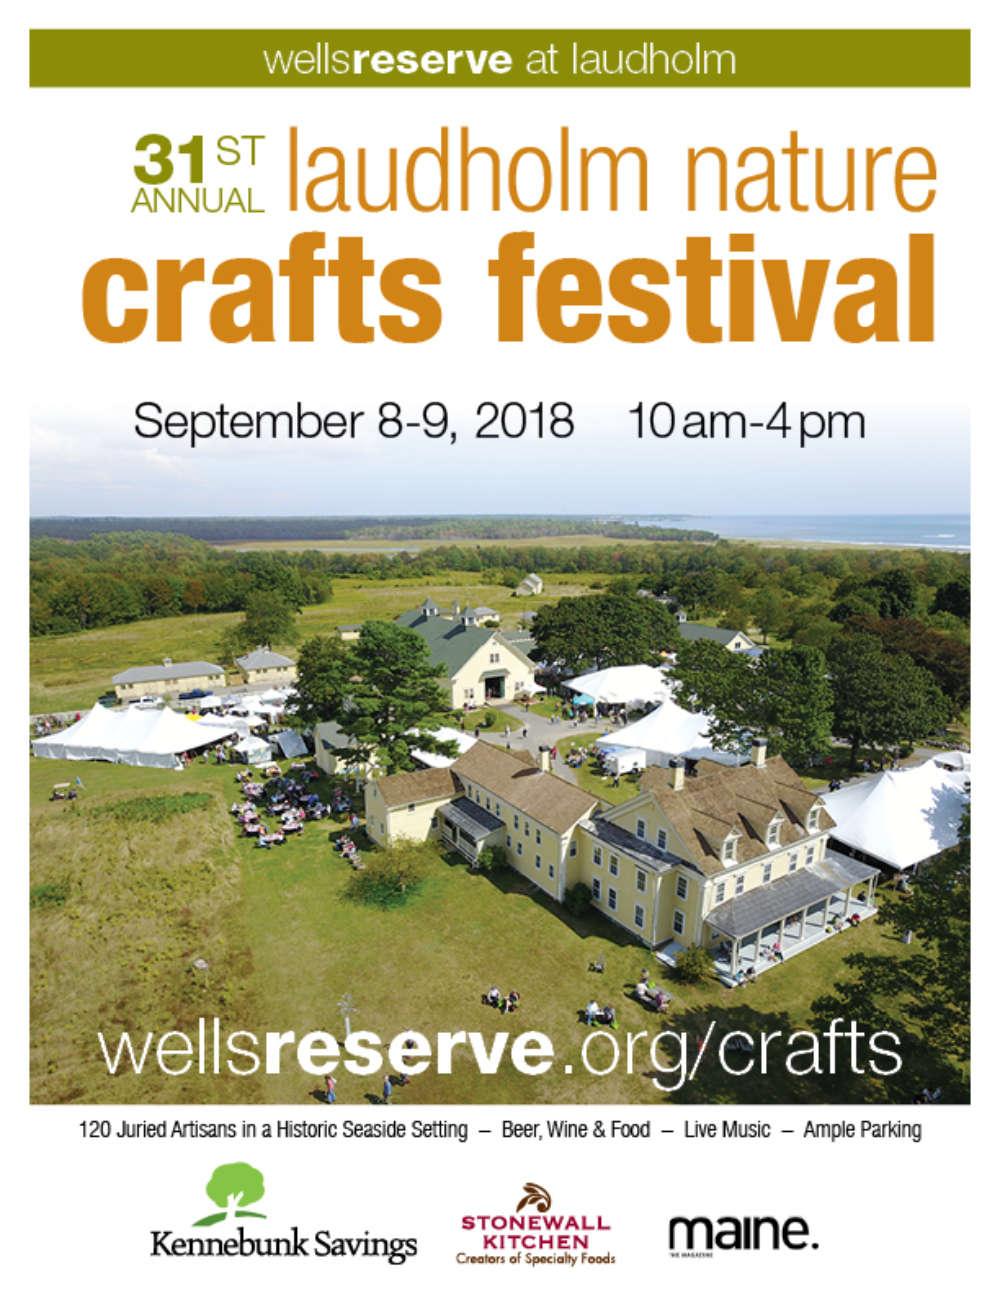 31st Laudholm Nature Crafts Festival Wells Reserve